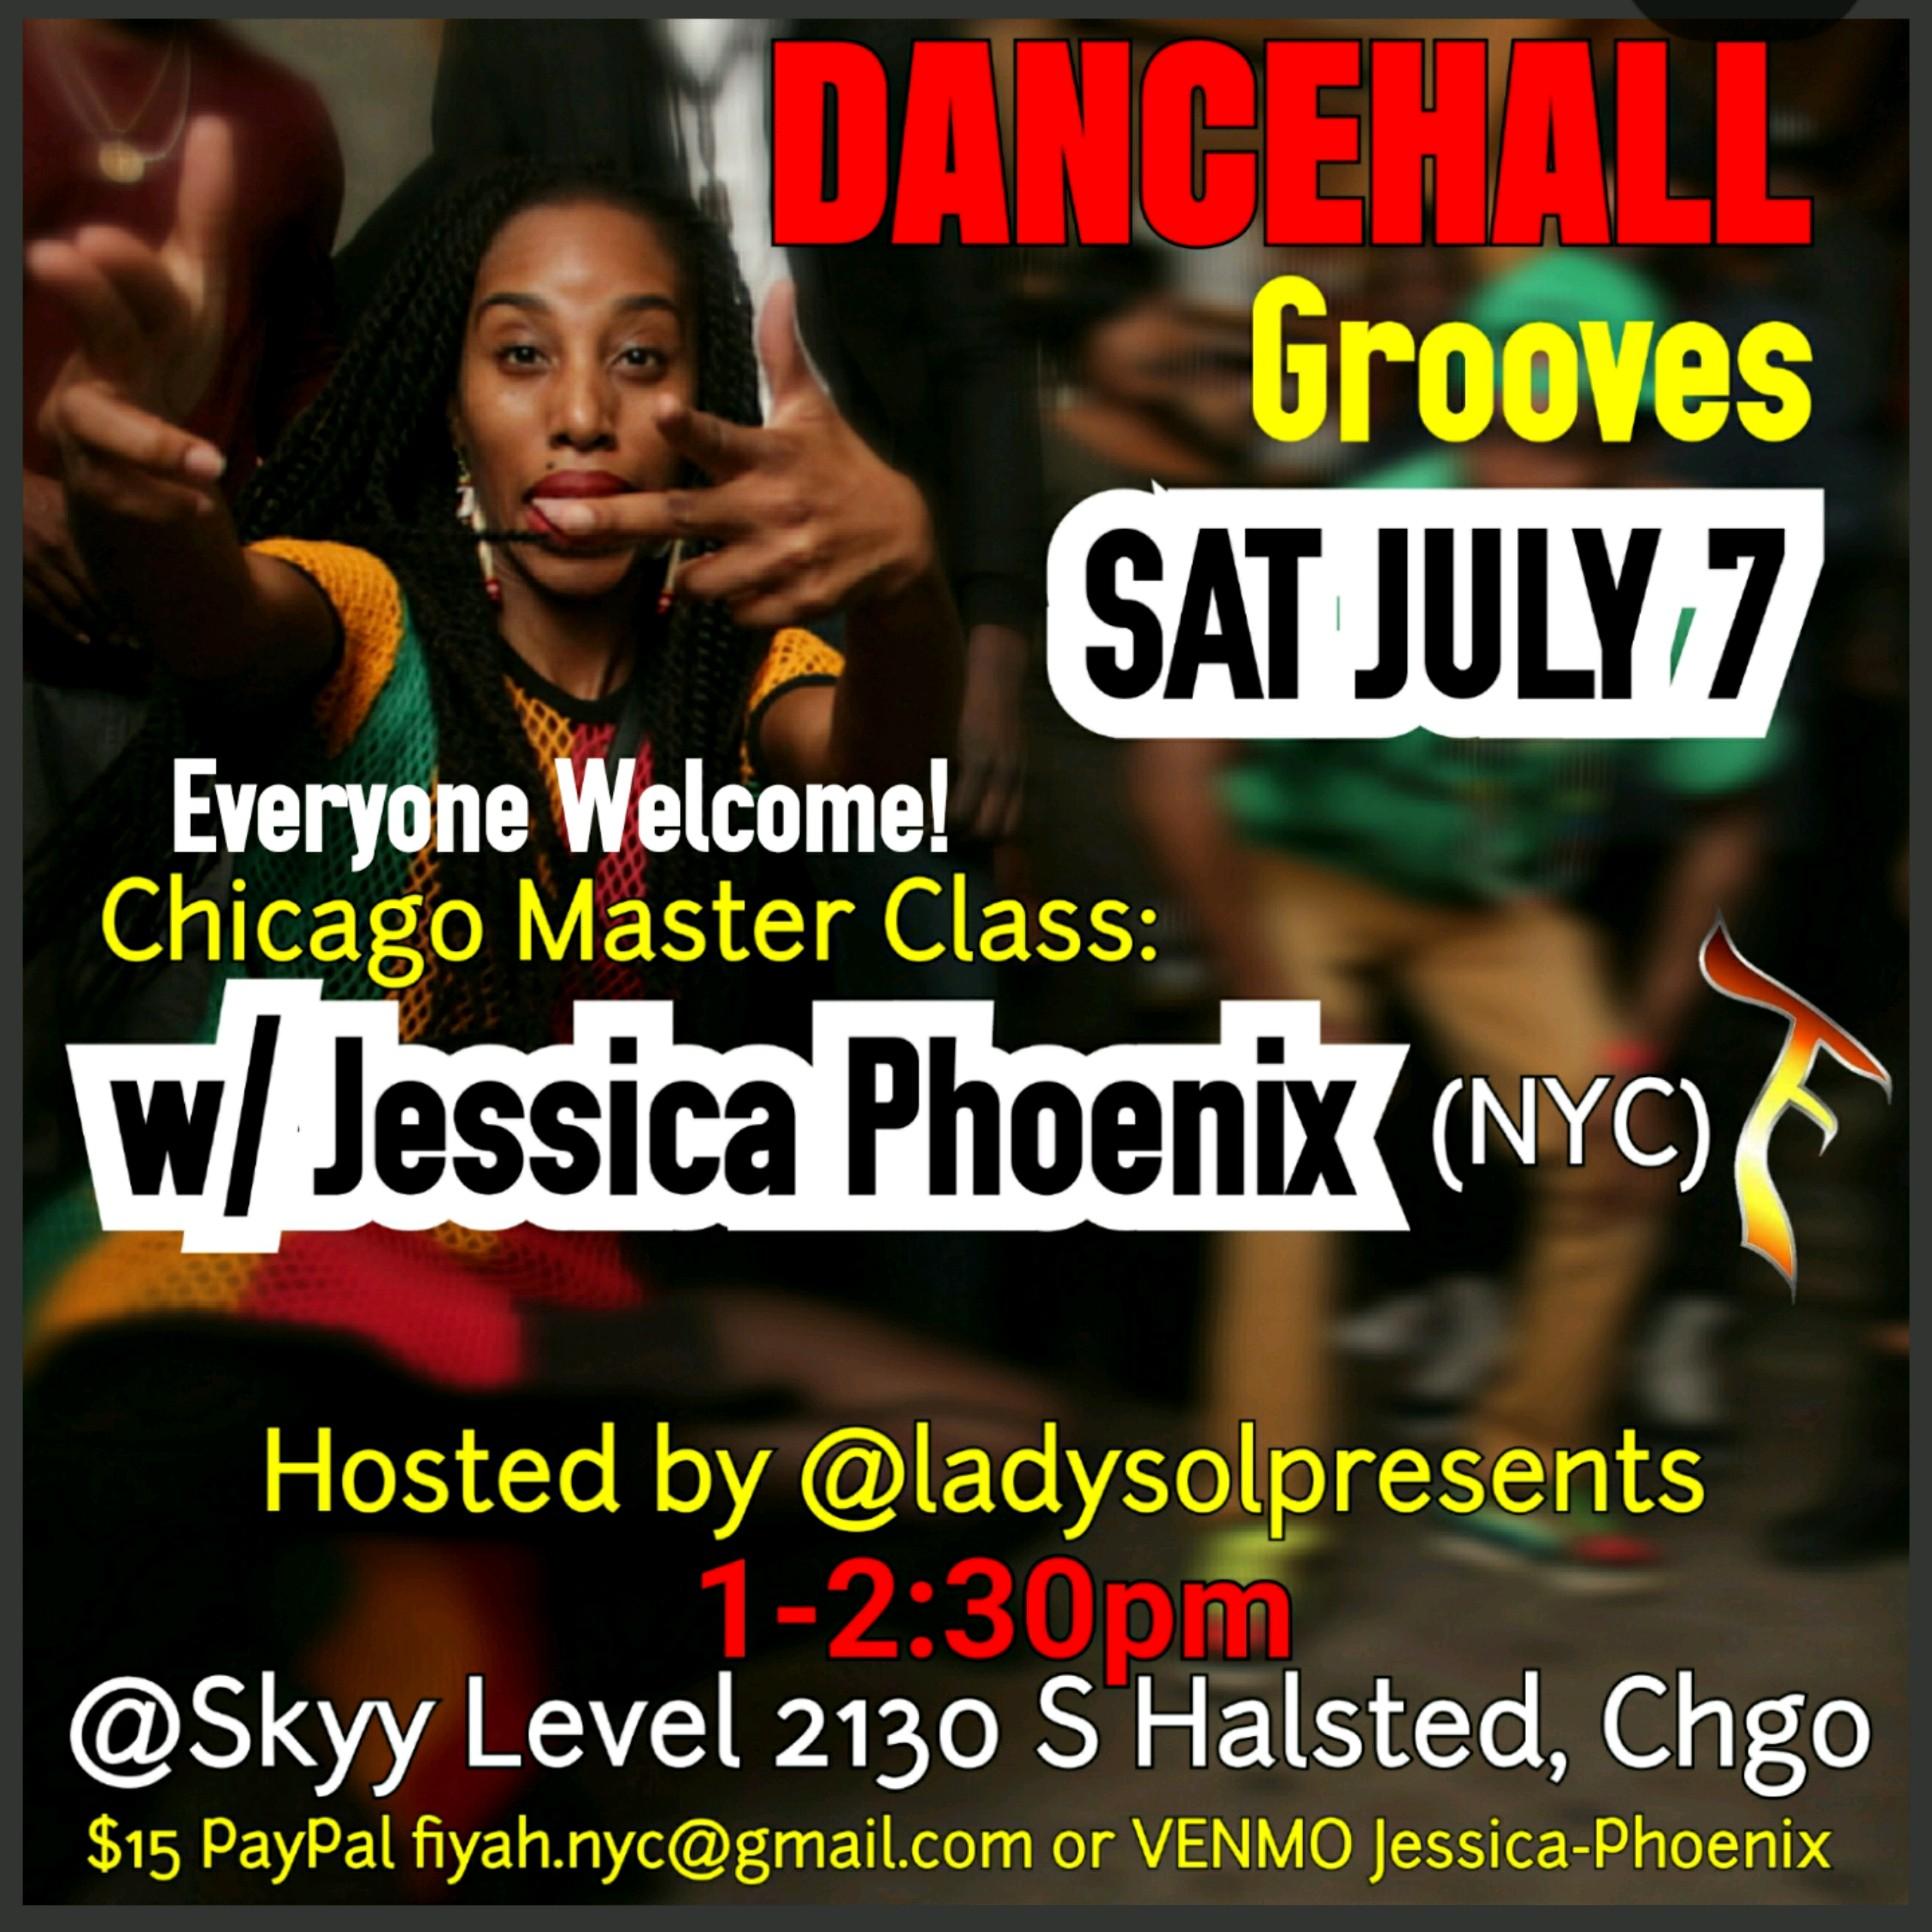 DANCEHALL Grooves w. JESSICA PHOENIX